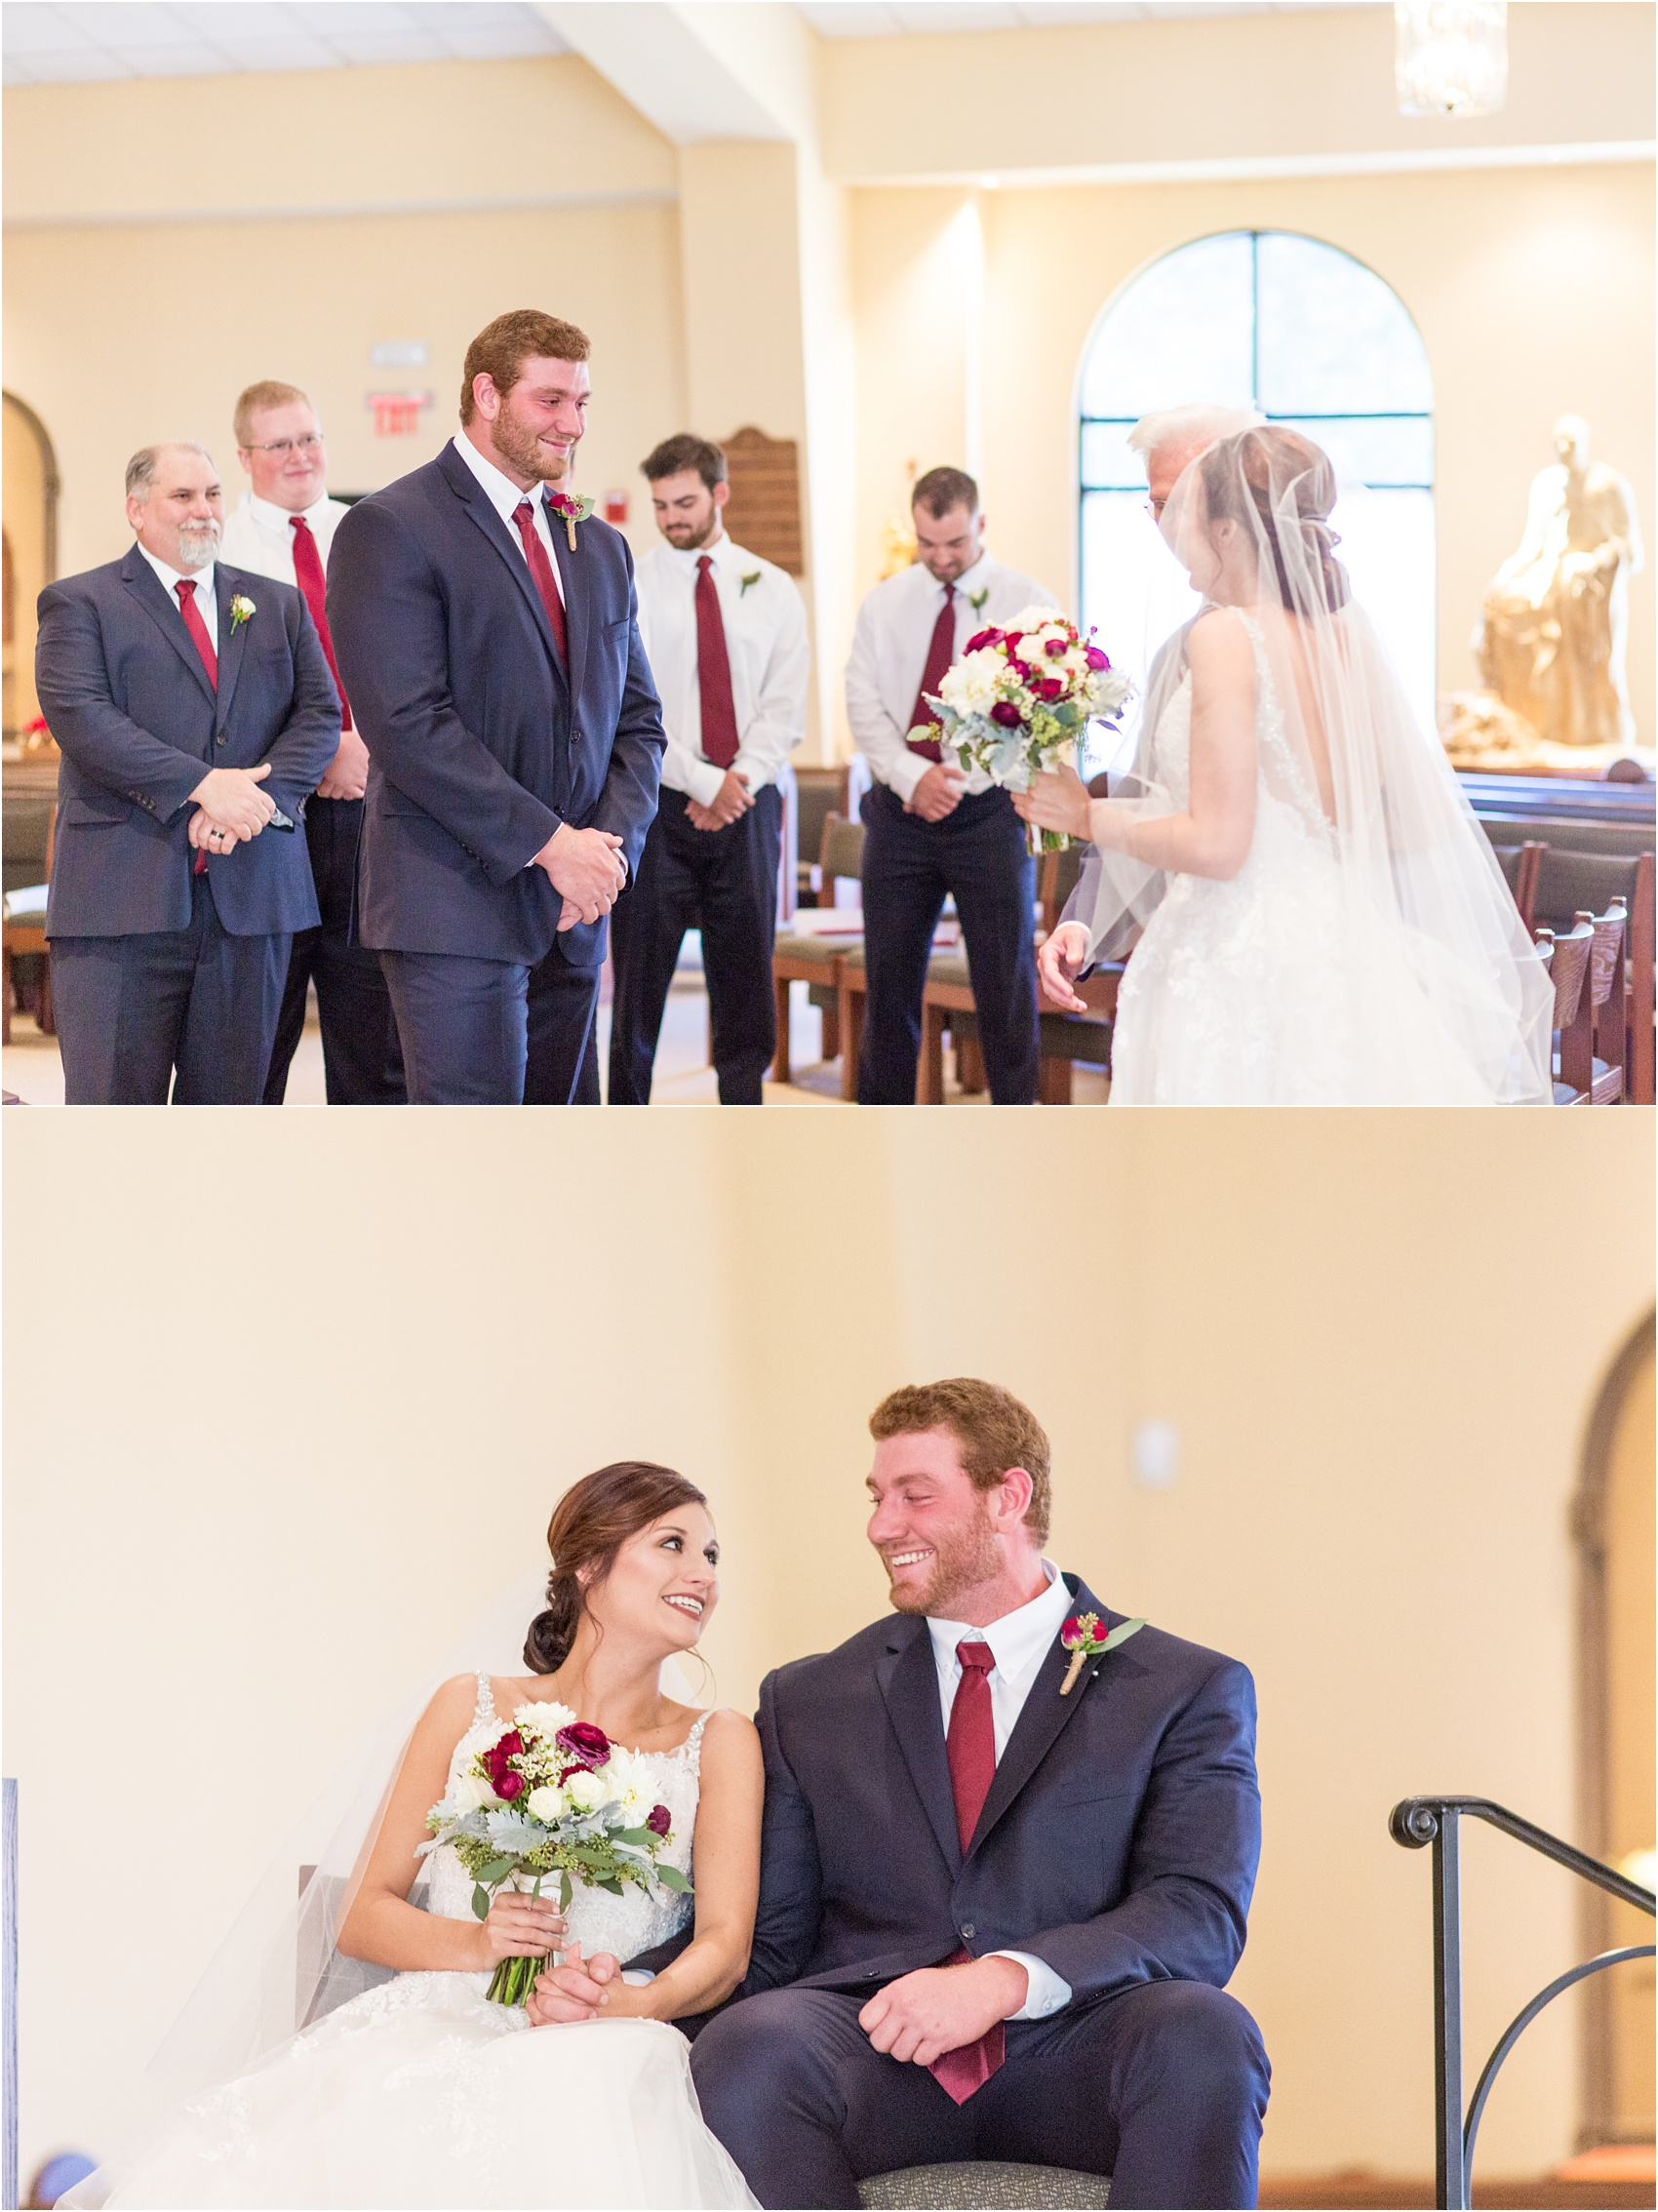 Savannah Eve Photography- May Wedding- Blog-4.jpg